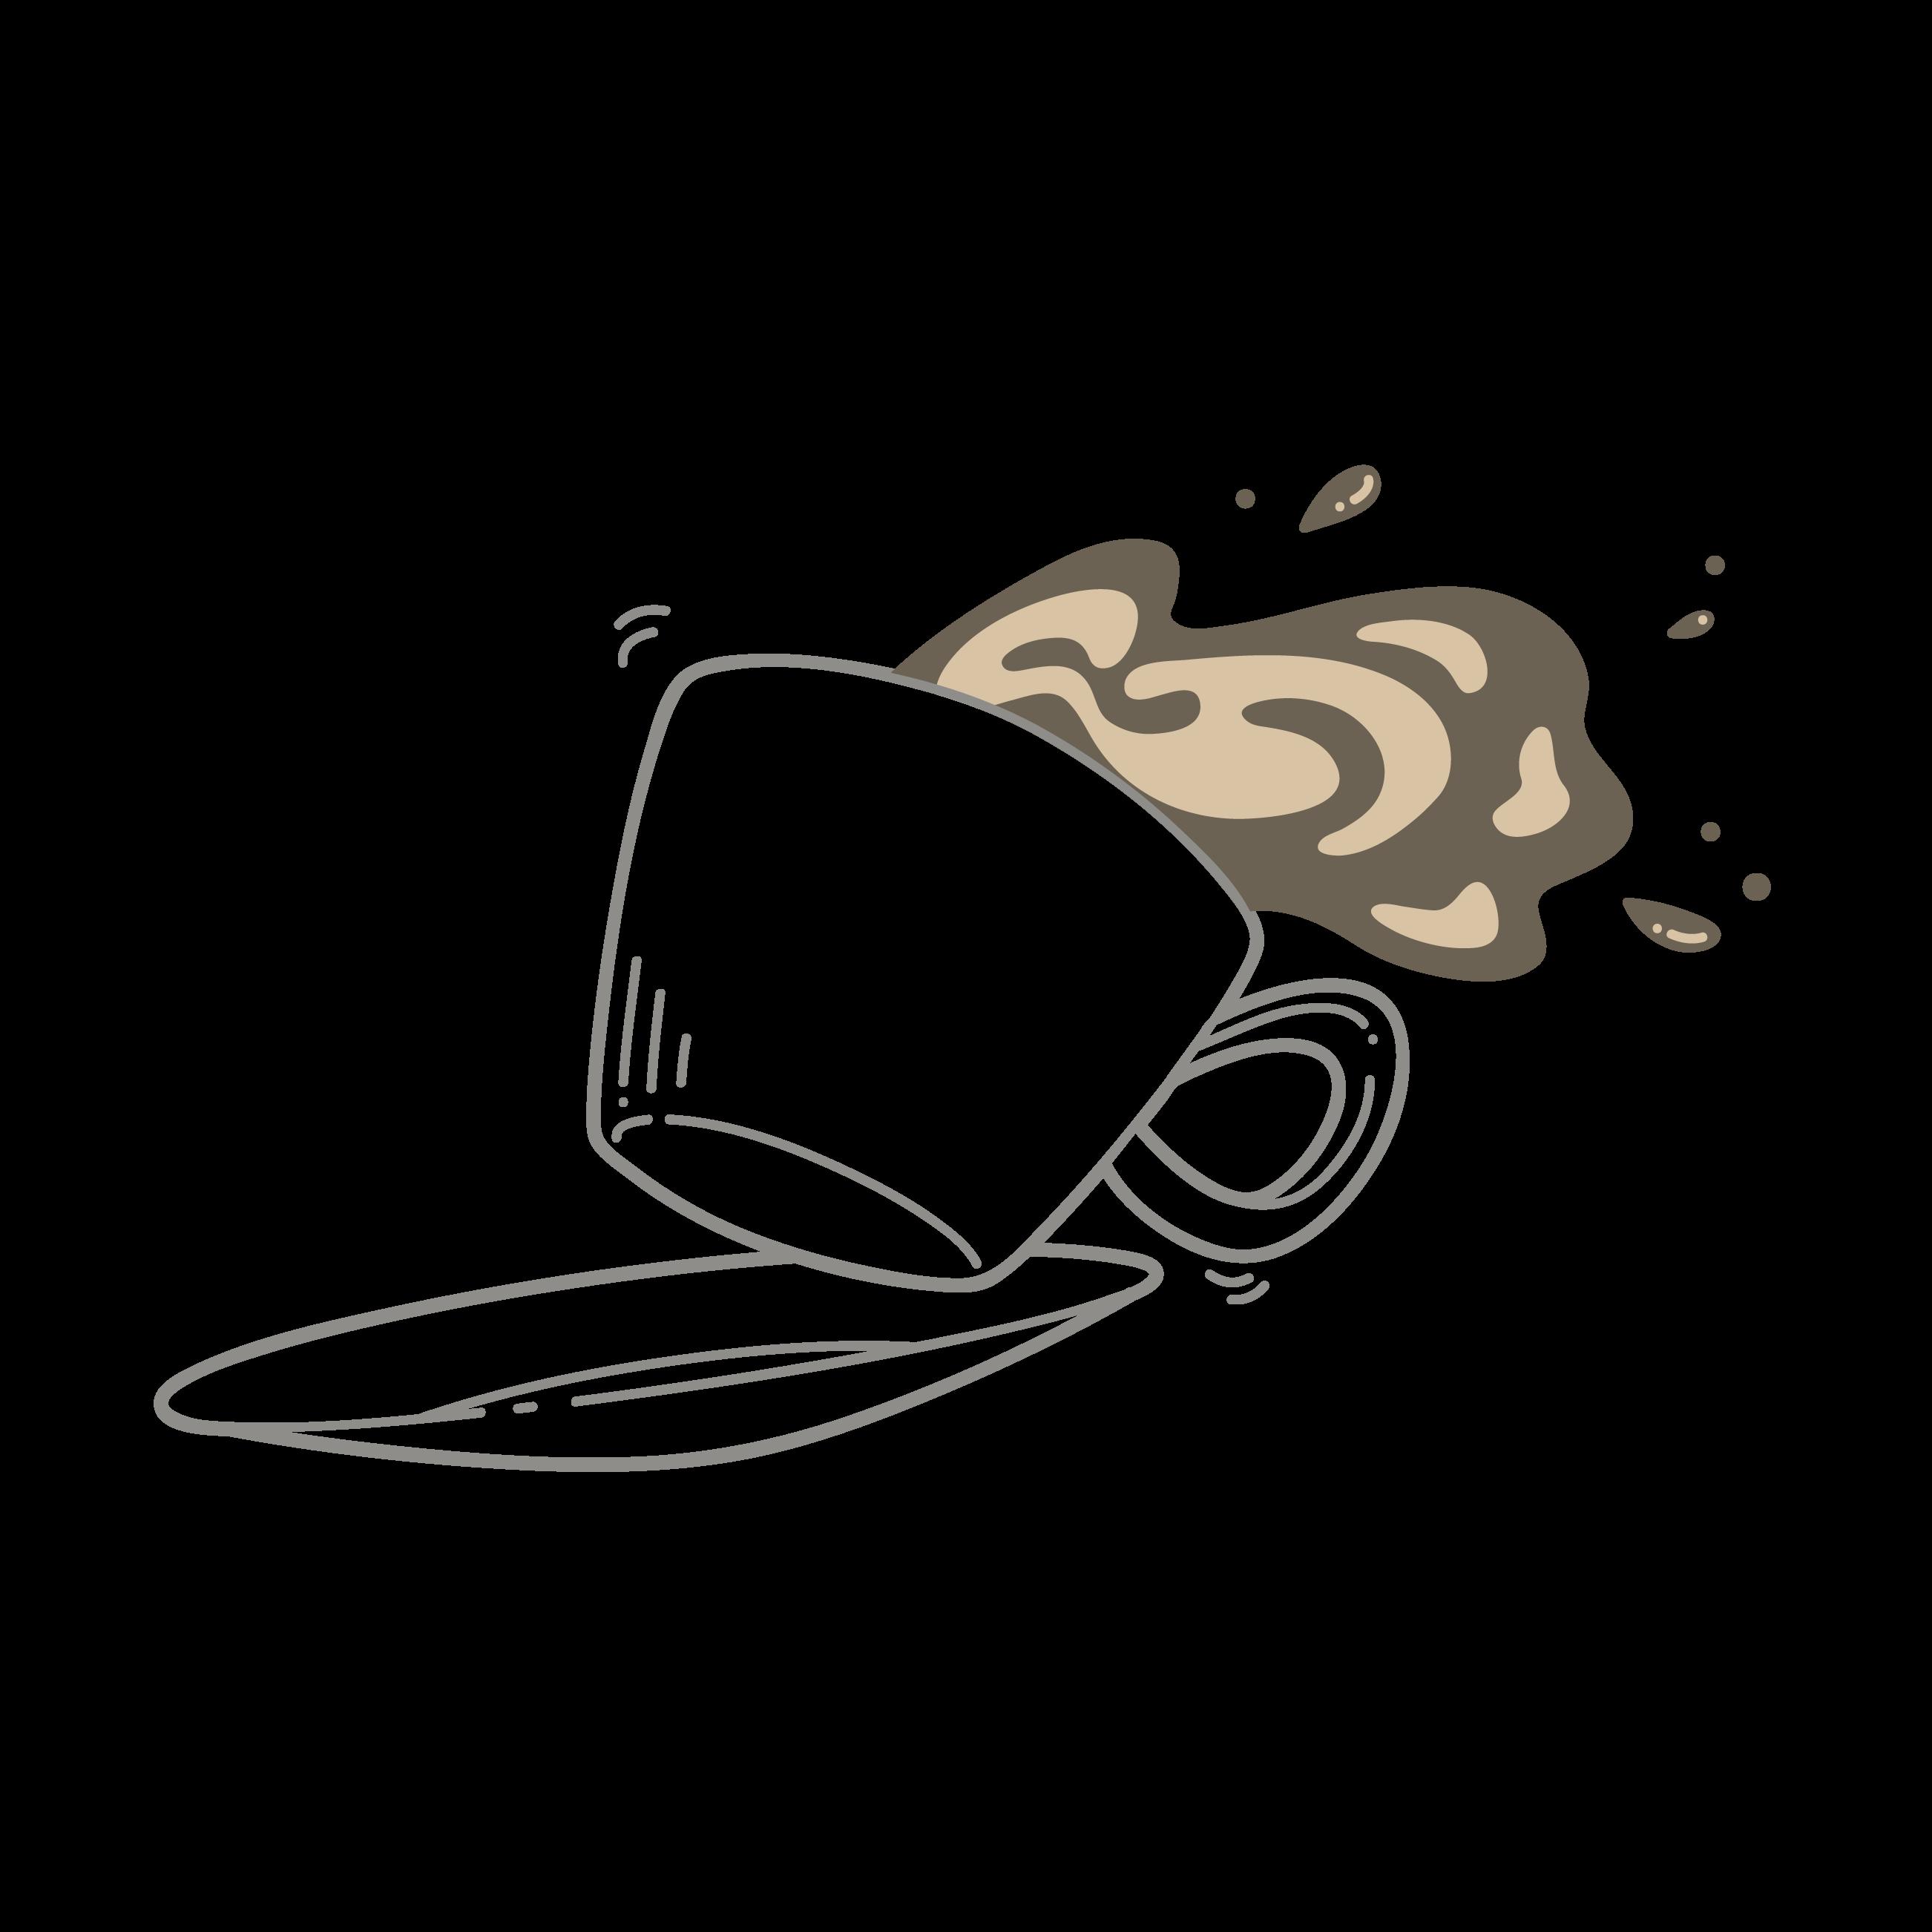 spilled_coffee-services_Espresso